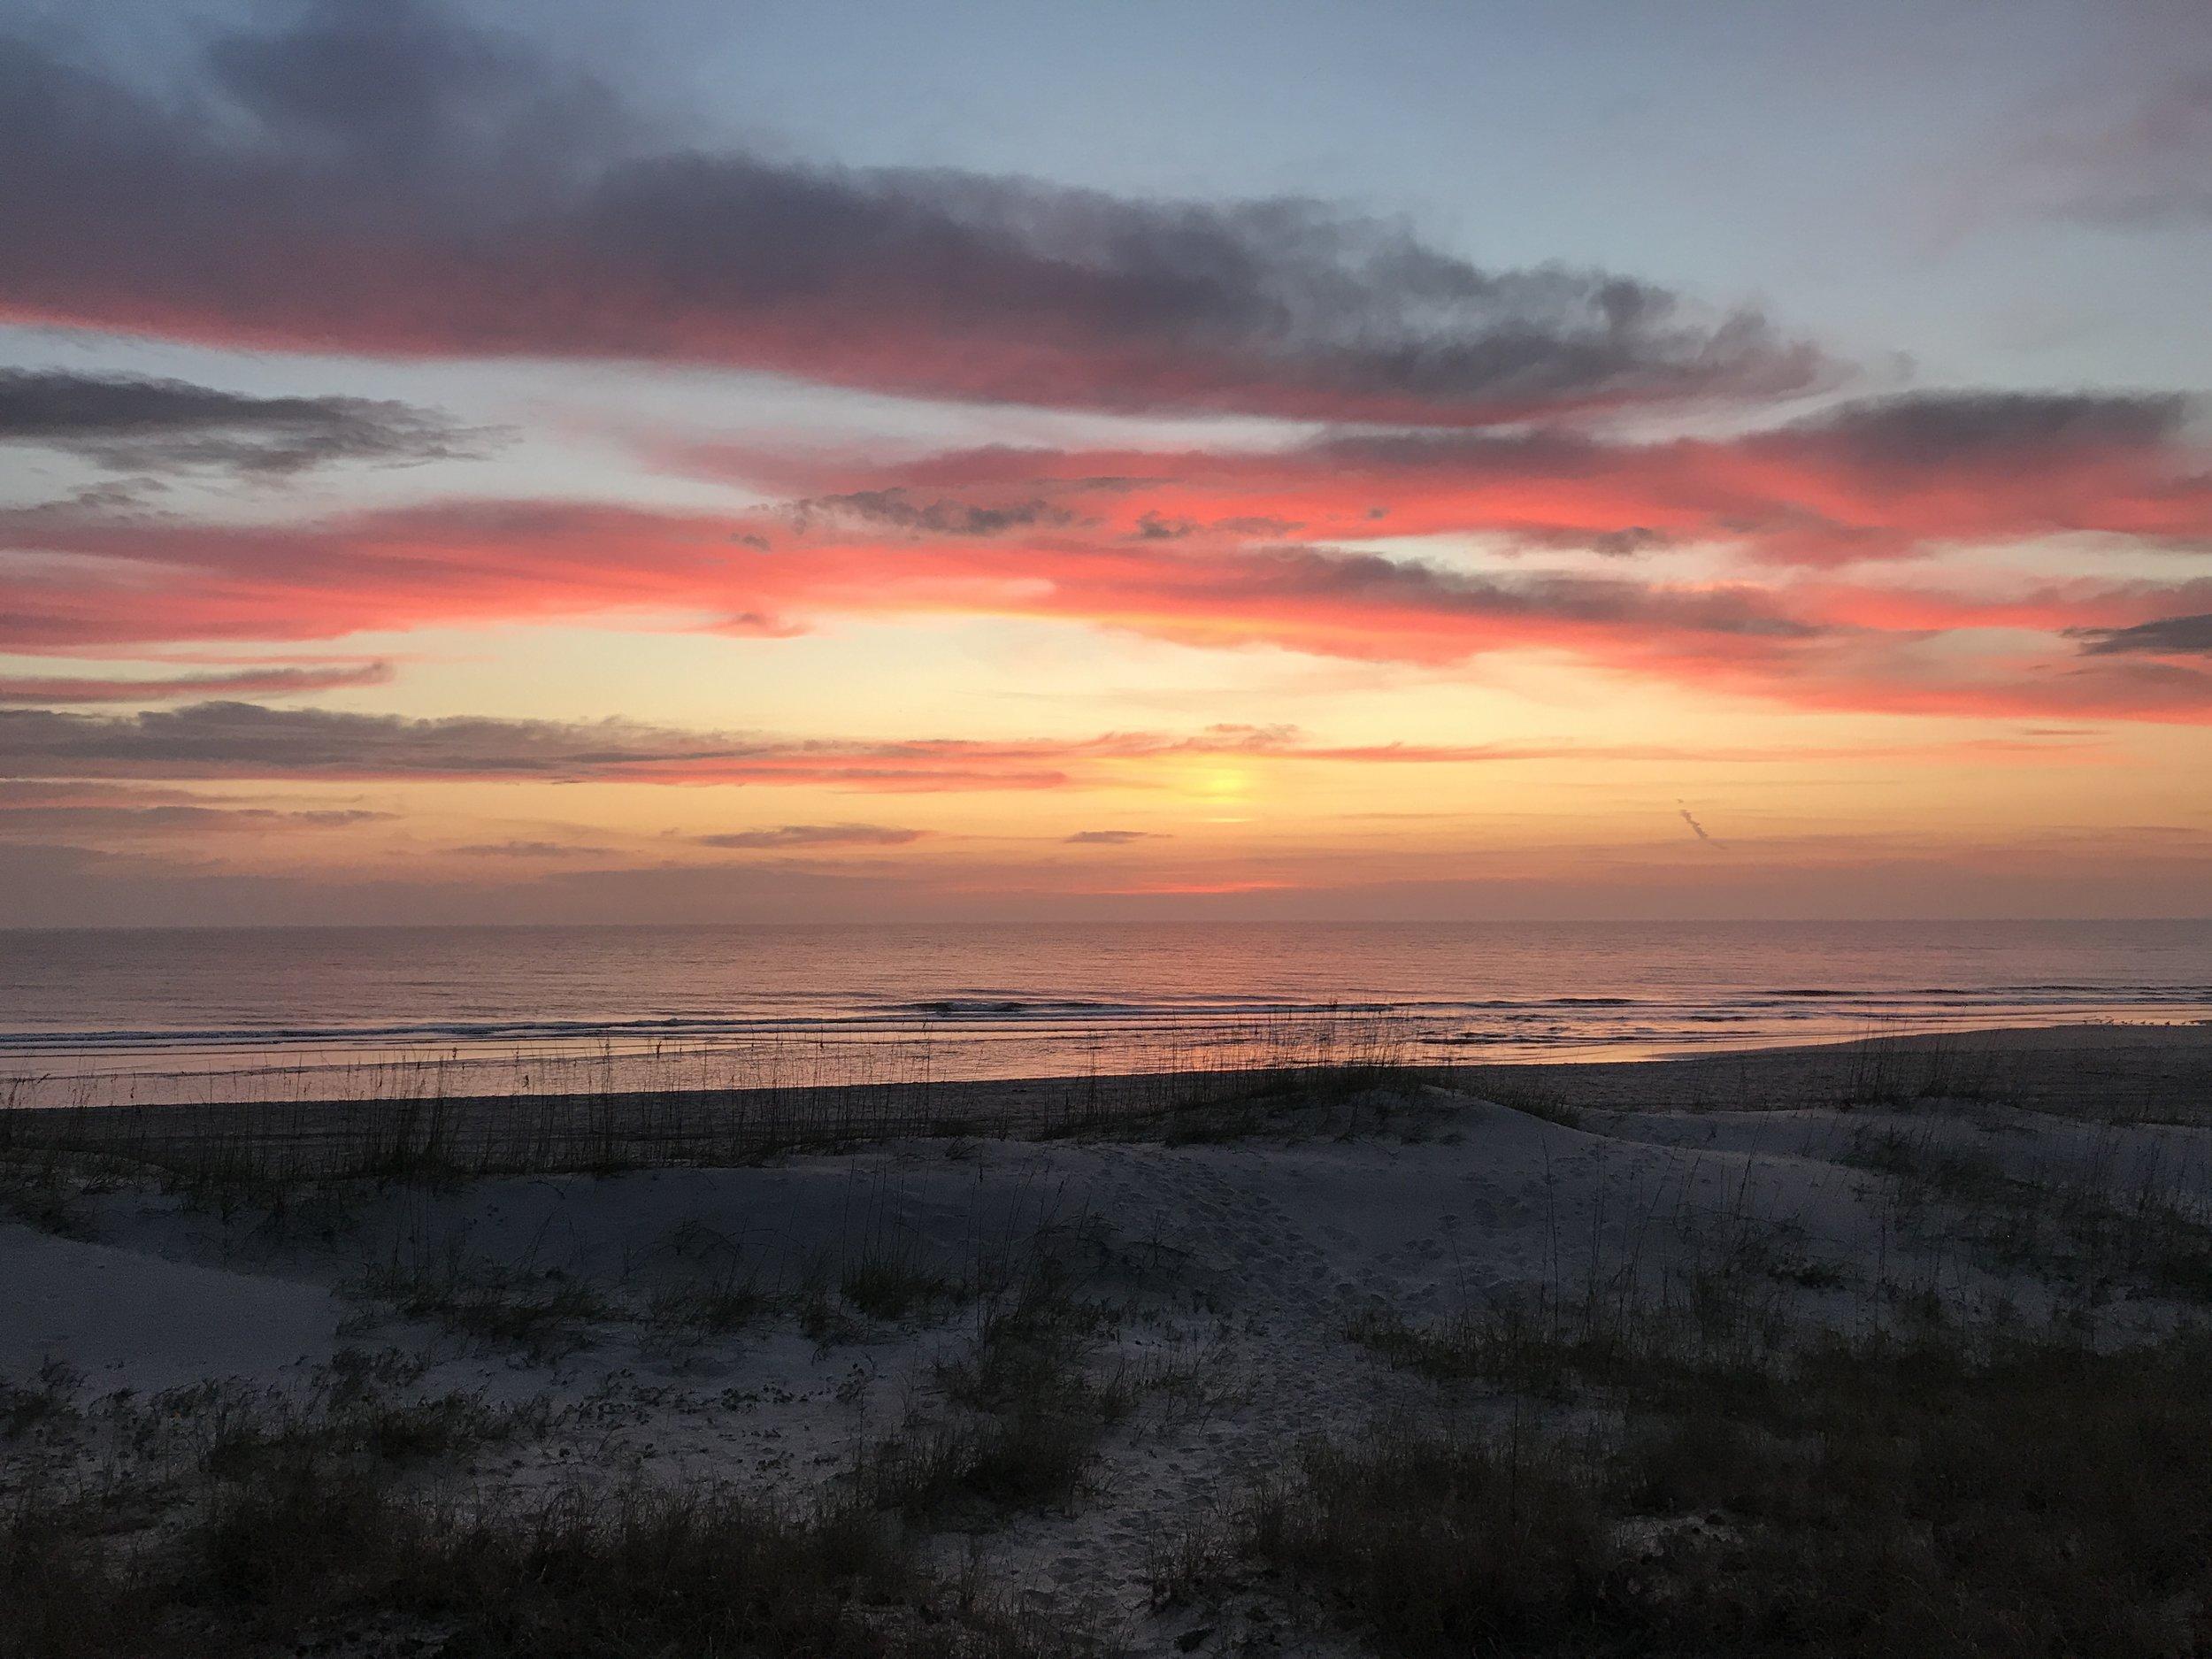 Sunrise, Amelia Island